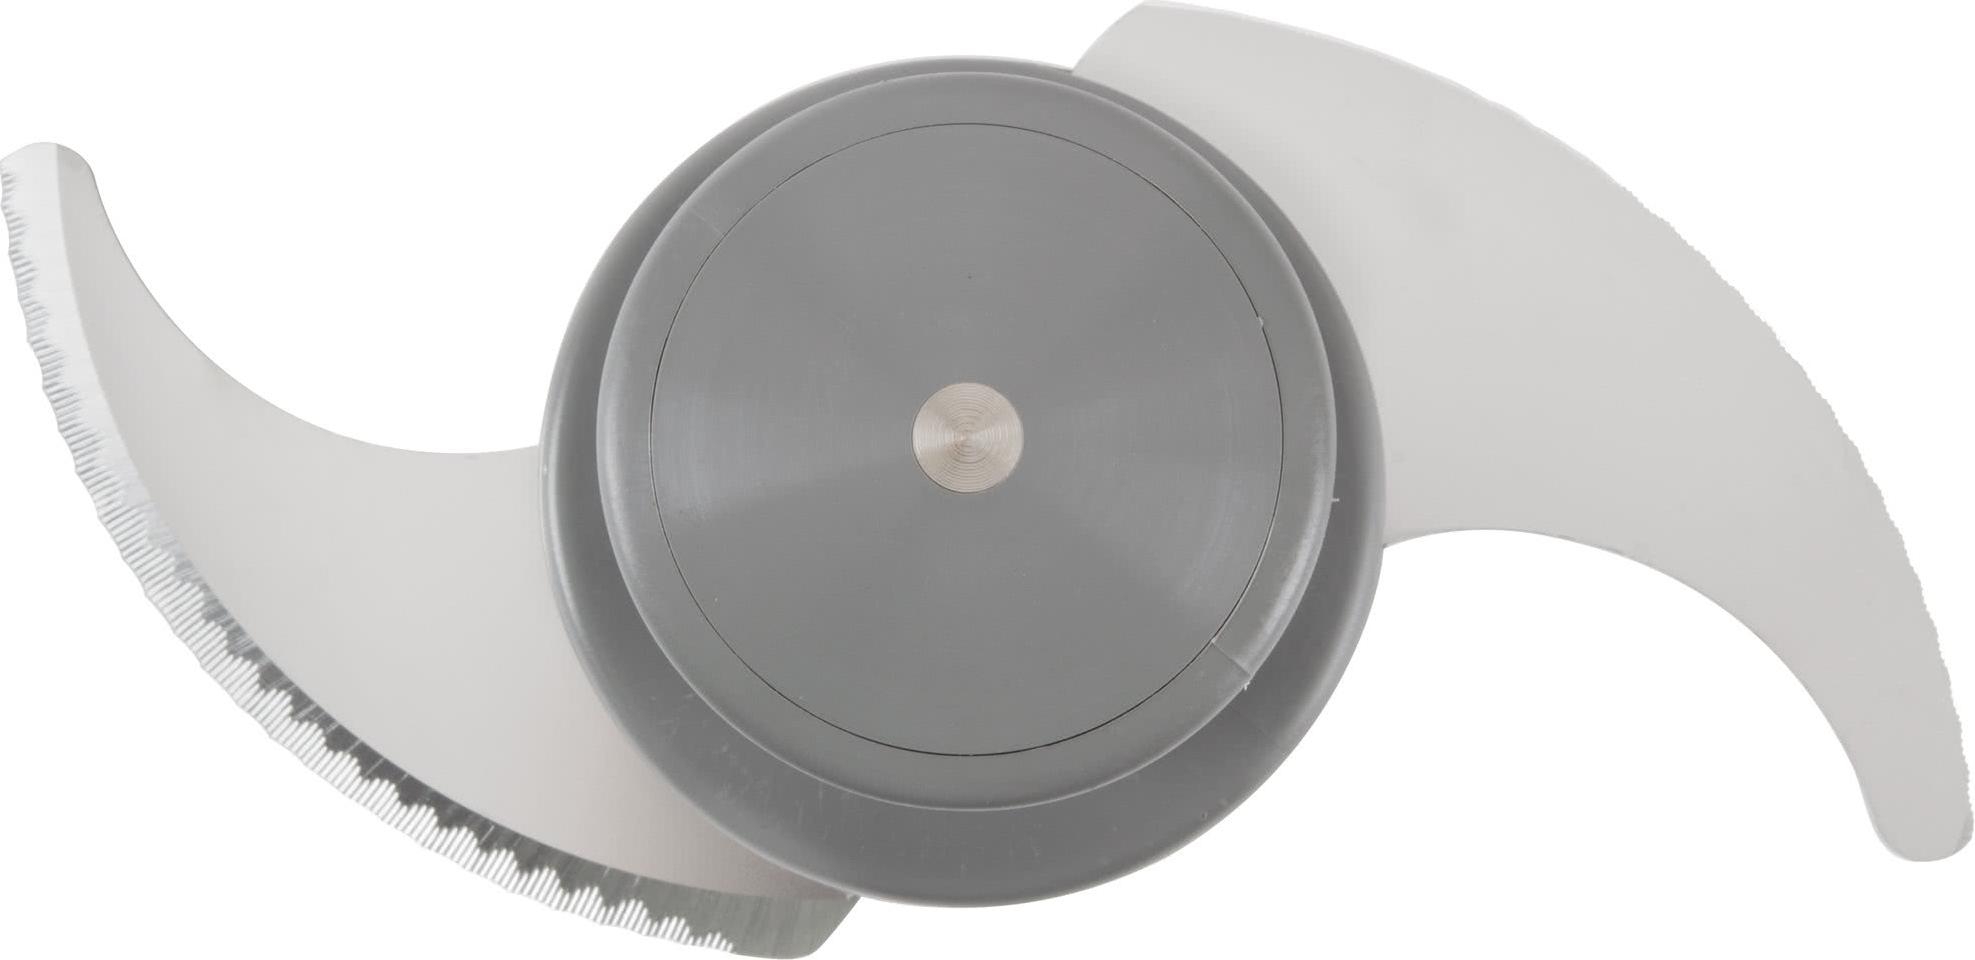 Зазубренный нож Robot Coupe 27155 - 3